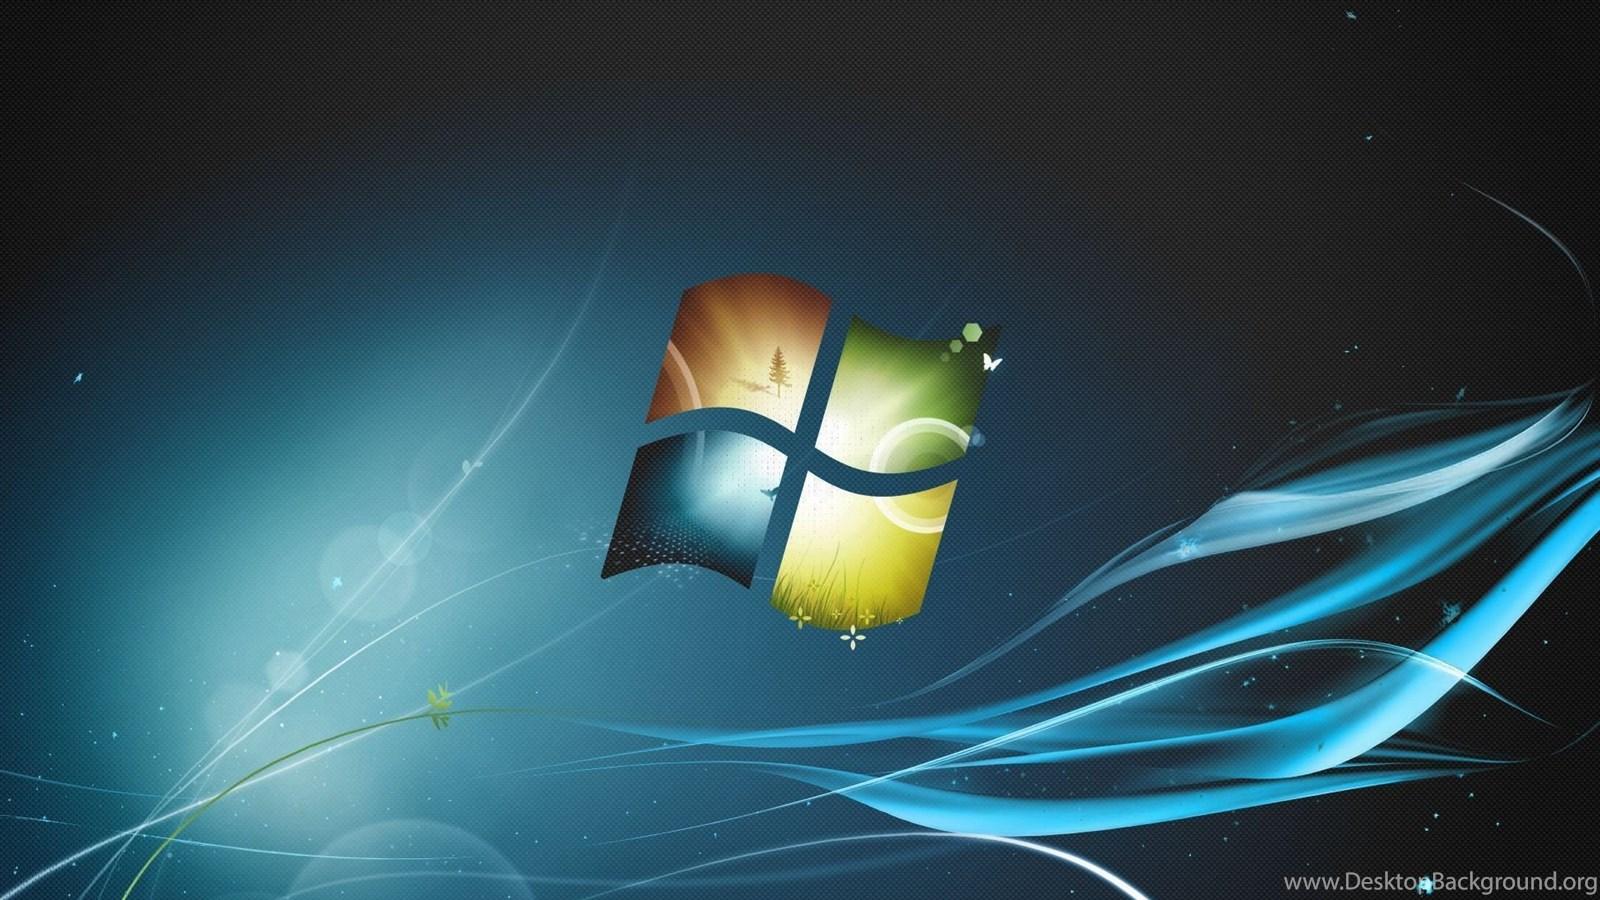 Windows 7 hd wallpapers download hd wallpapers desktop - Hd wallpapers for pc windows ...